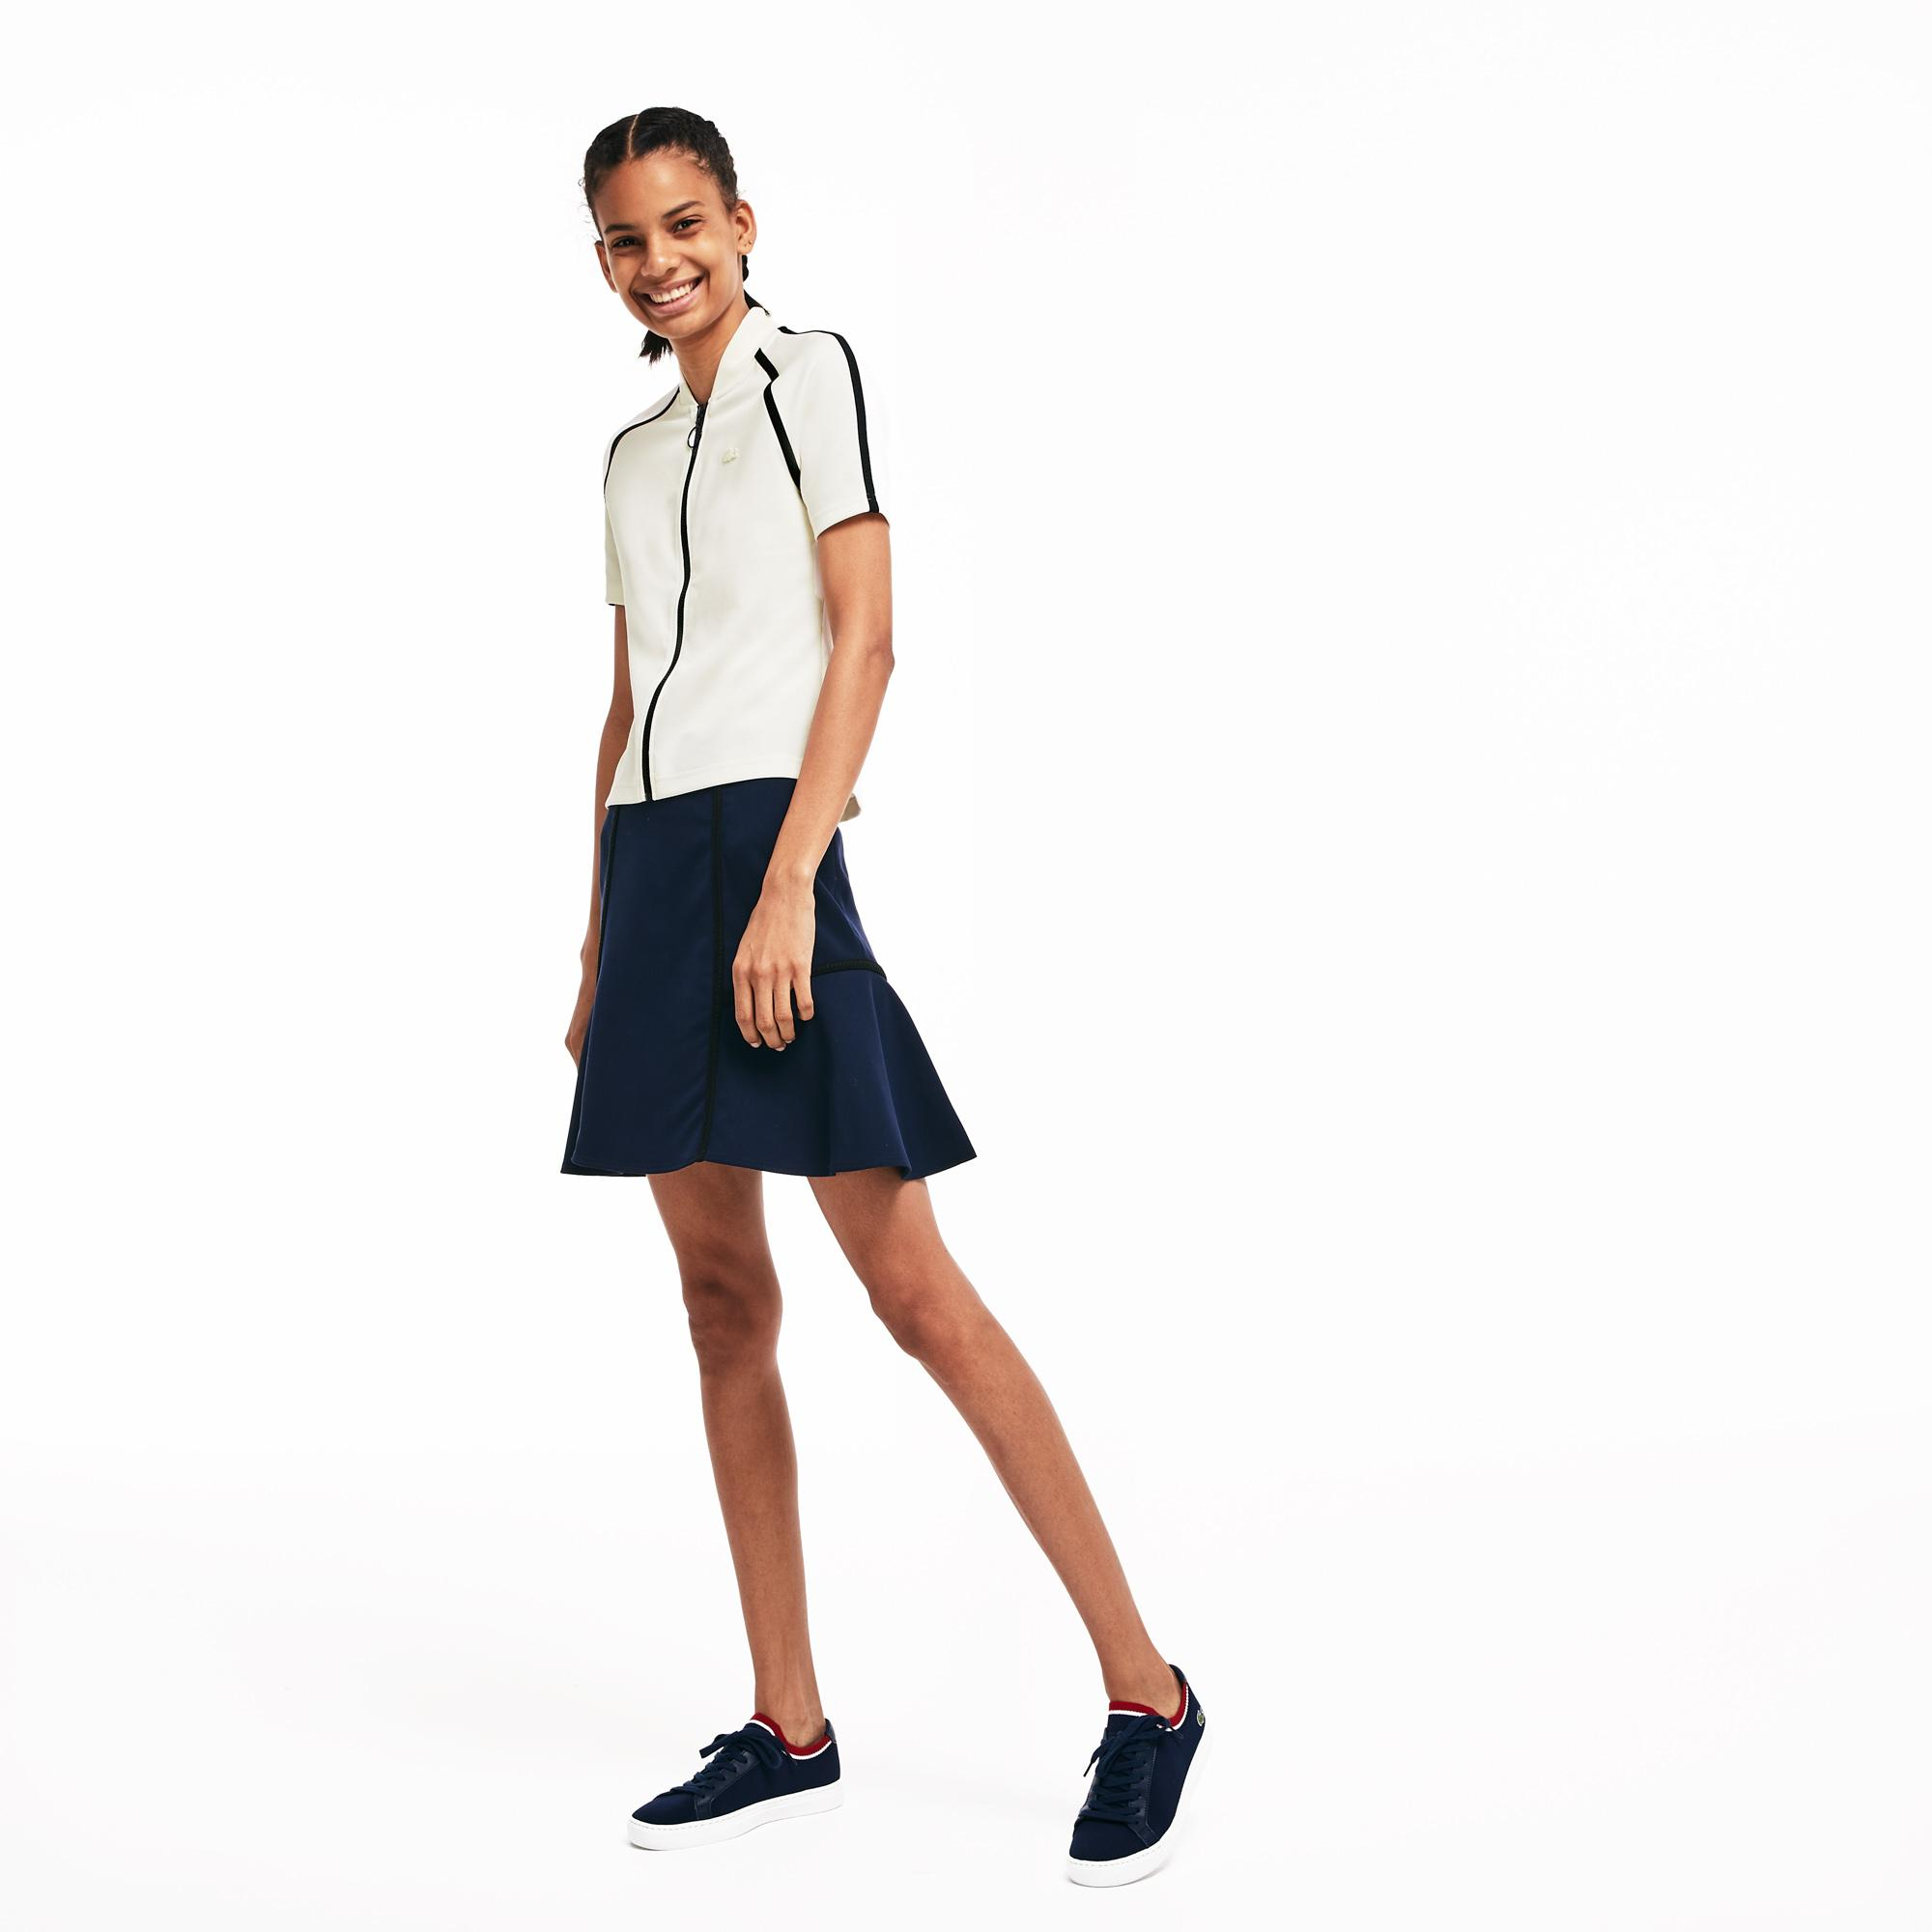 Lacoste L!VE Women's Slim Fit Polo